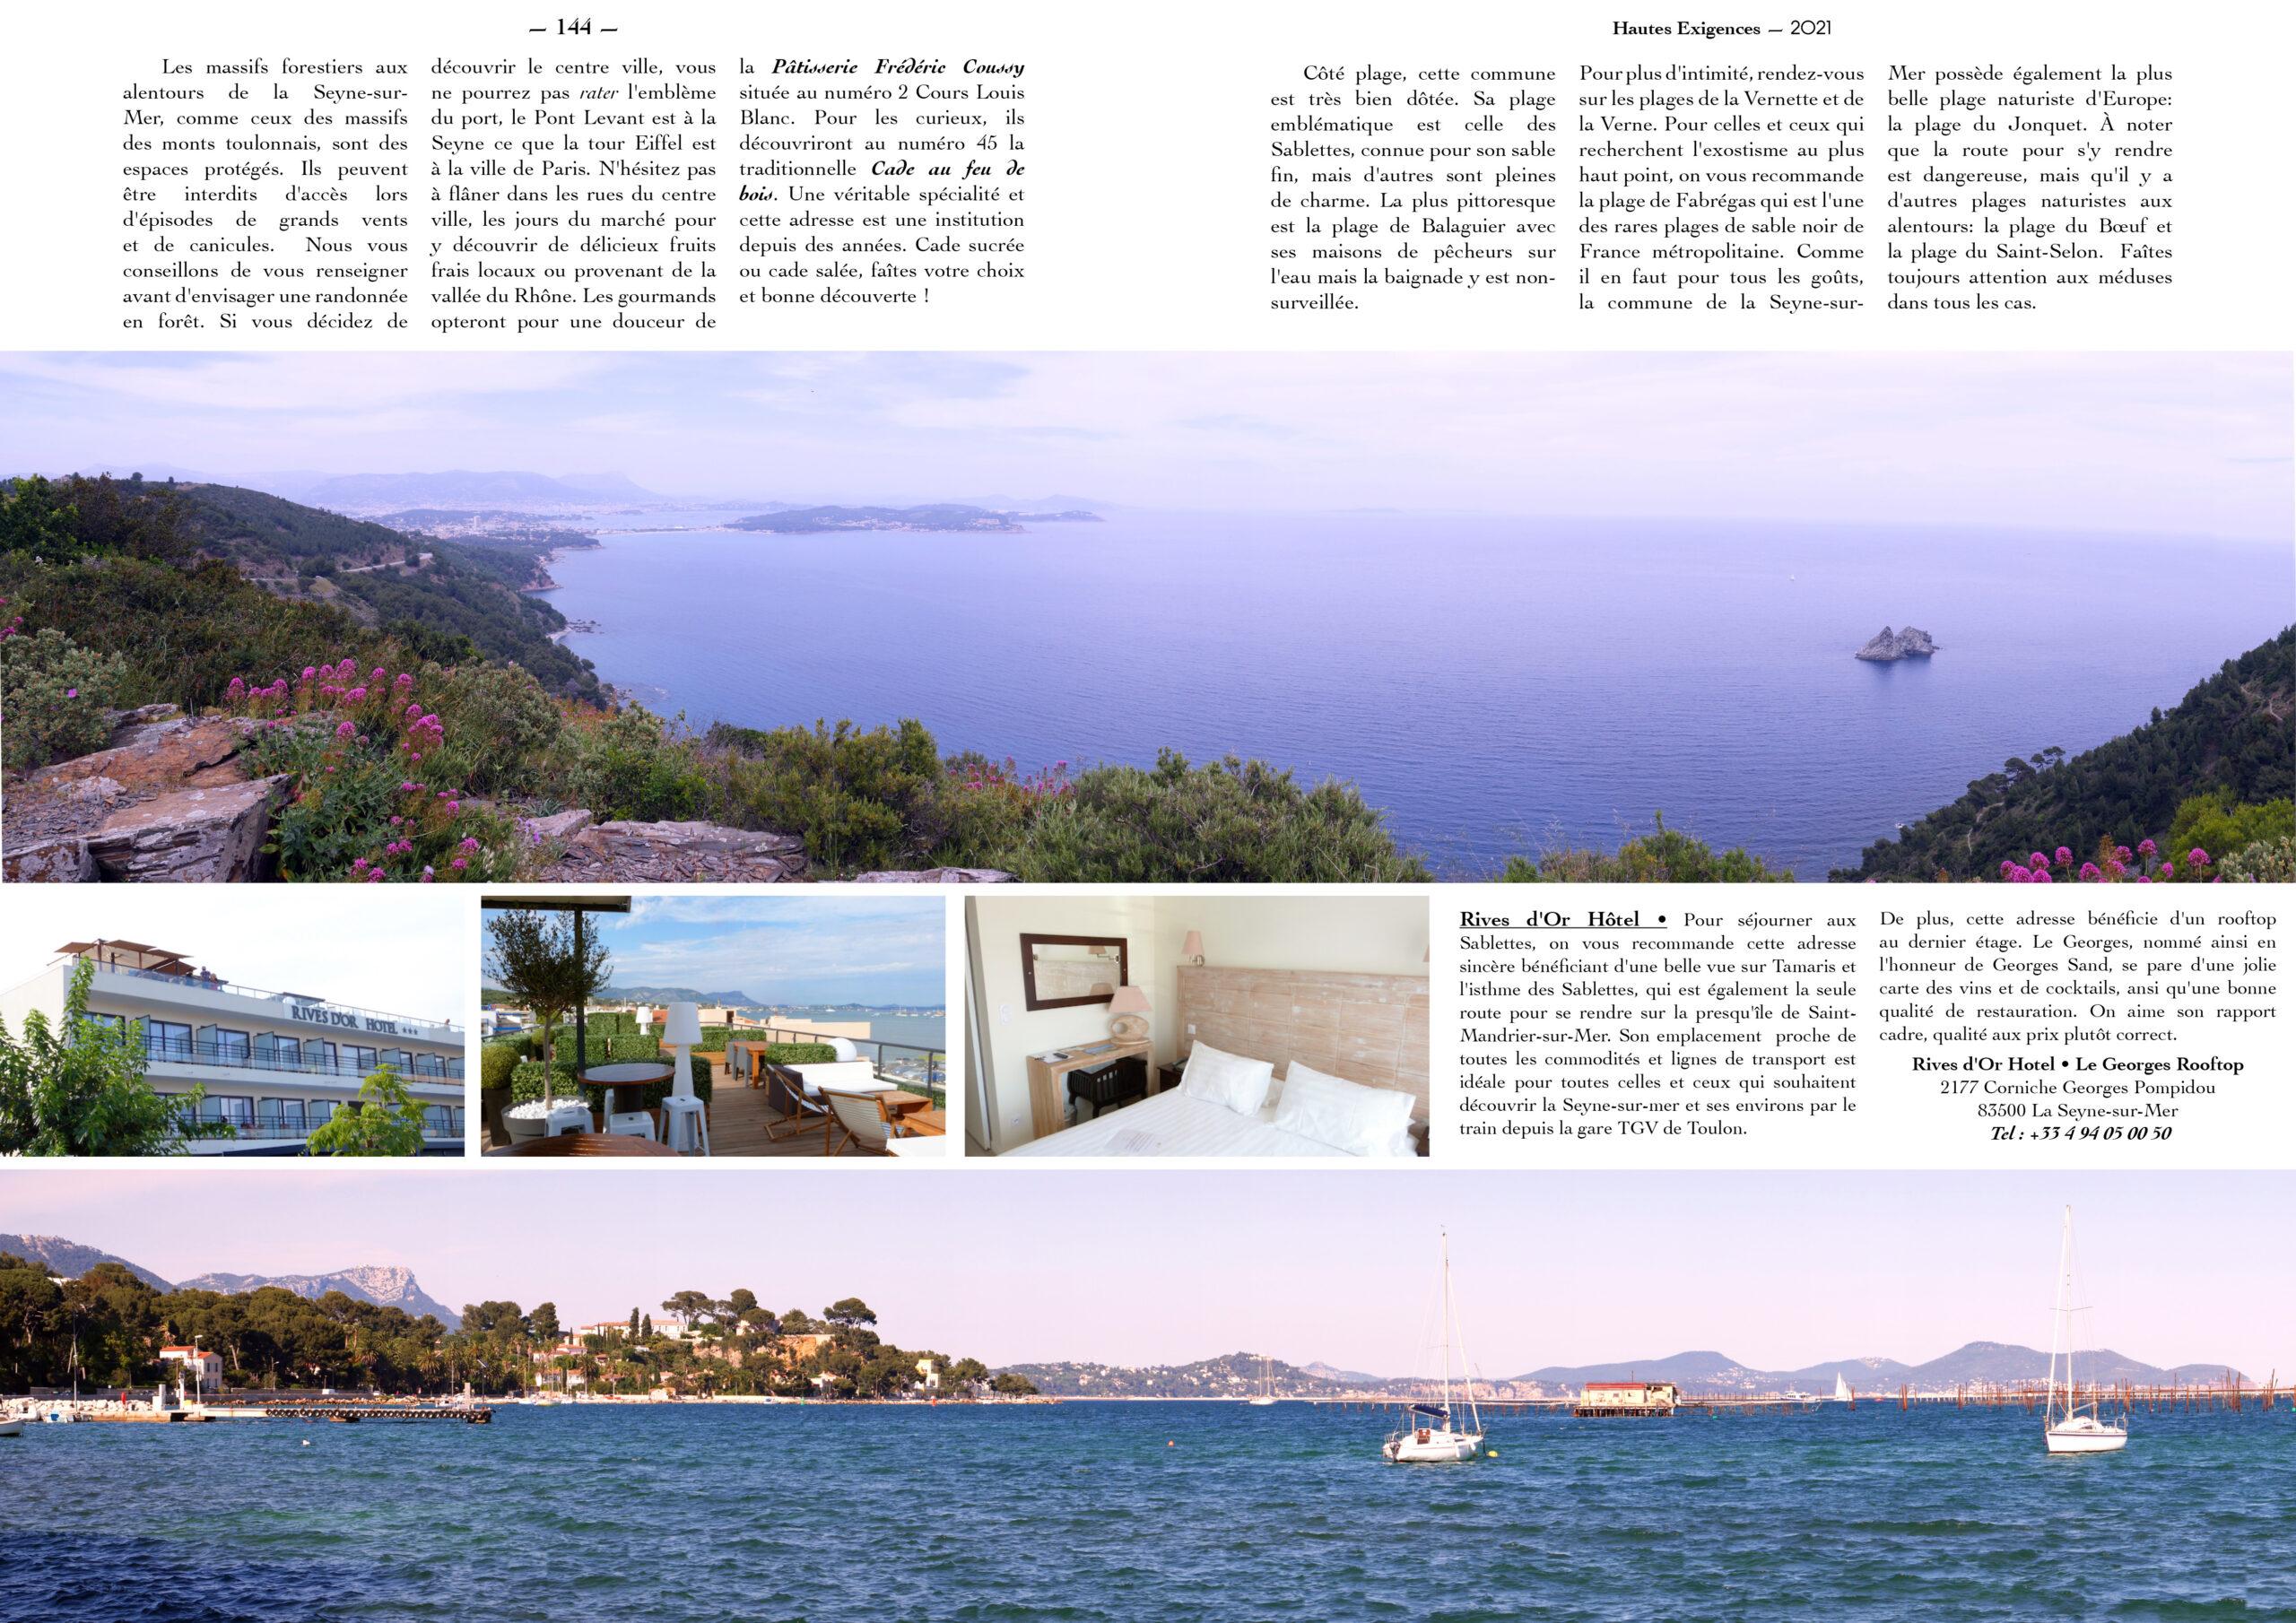 Hautes Exigences Magazine Hors Serie 2021 page 142-143